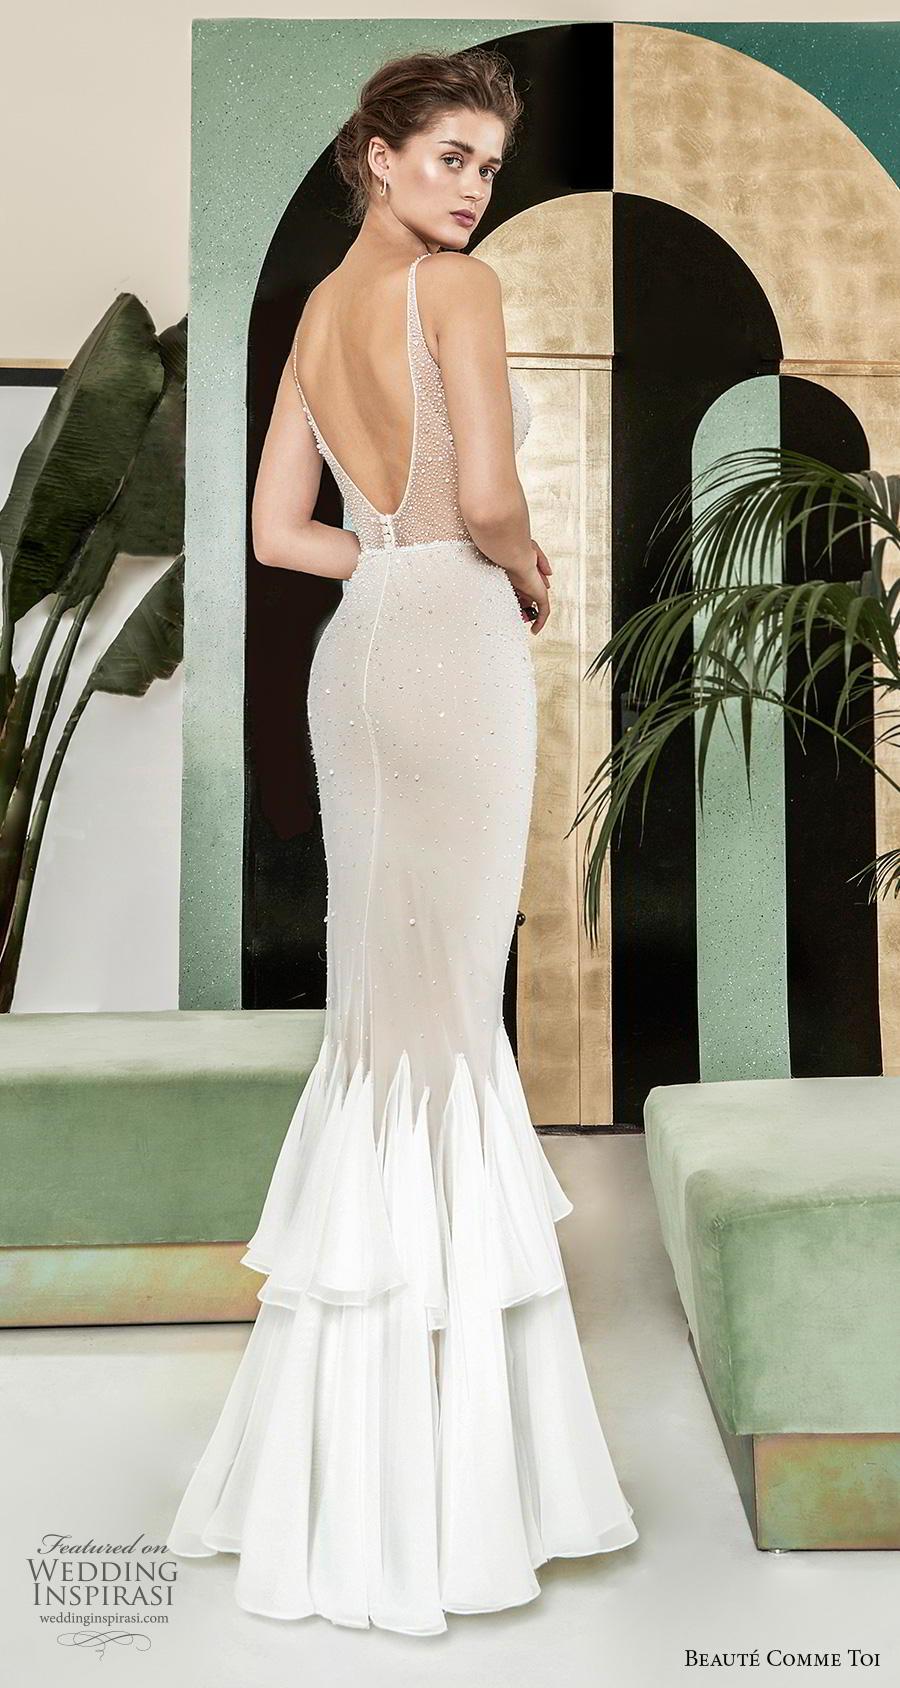 beaute comme toi 2019 bridal sleeveless with strap illusion v sweetheart neckline heavily embellished bodice glitter elegant mermaid wedding dress (mirianna) bv